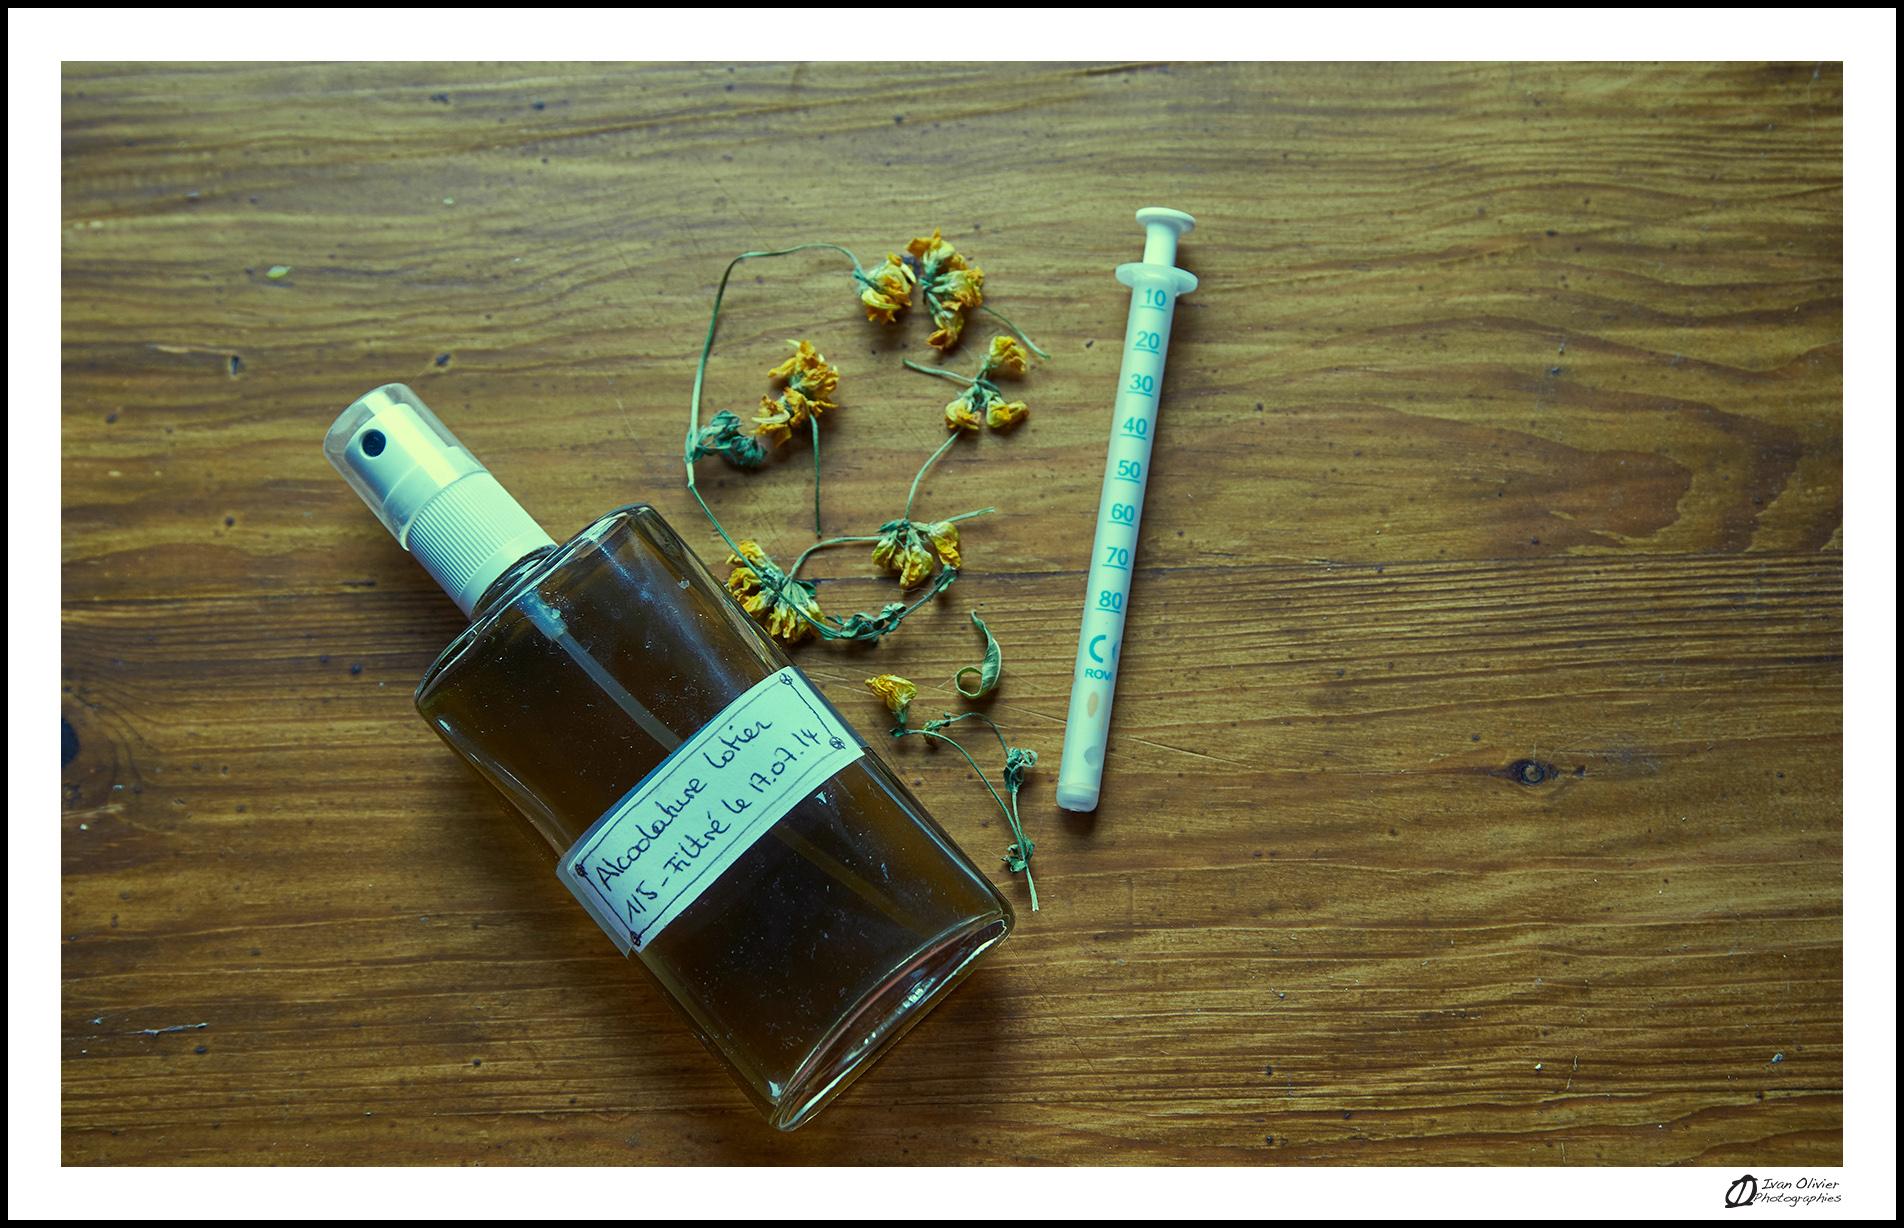 GC - escalade medicinale - cueillette - lotier corniculé lotus corniculatus - ivan olivier photographies (1)